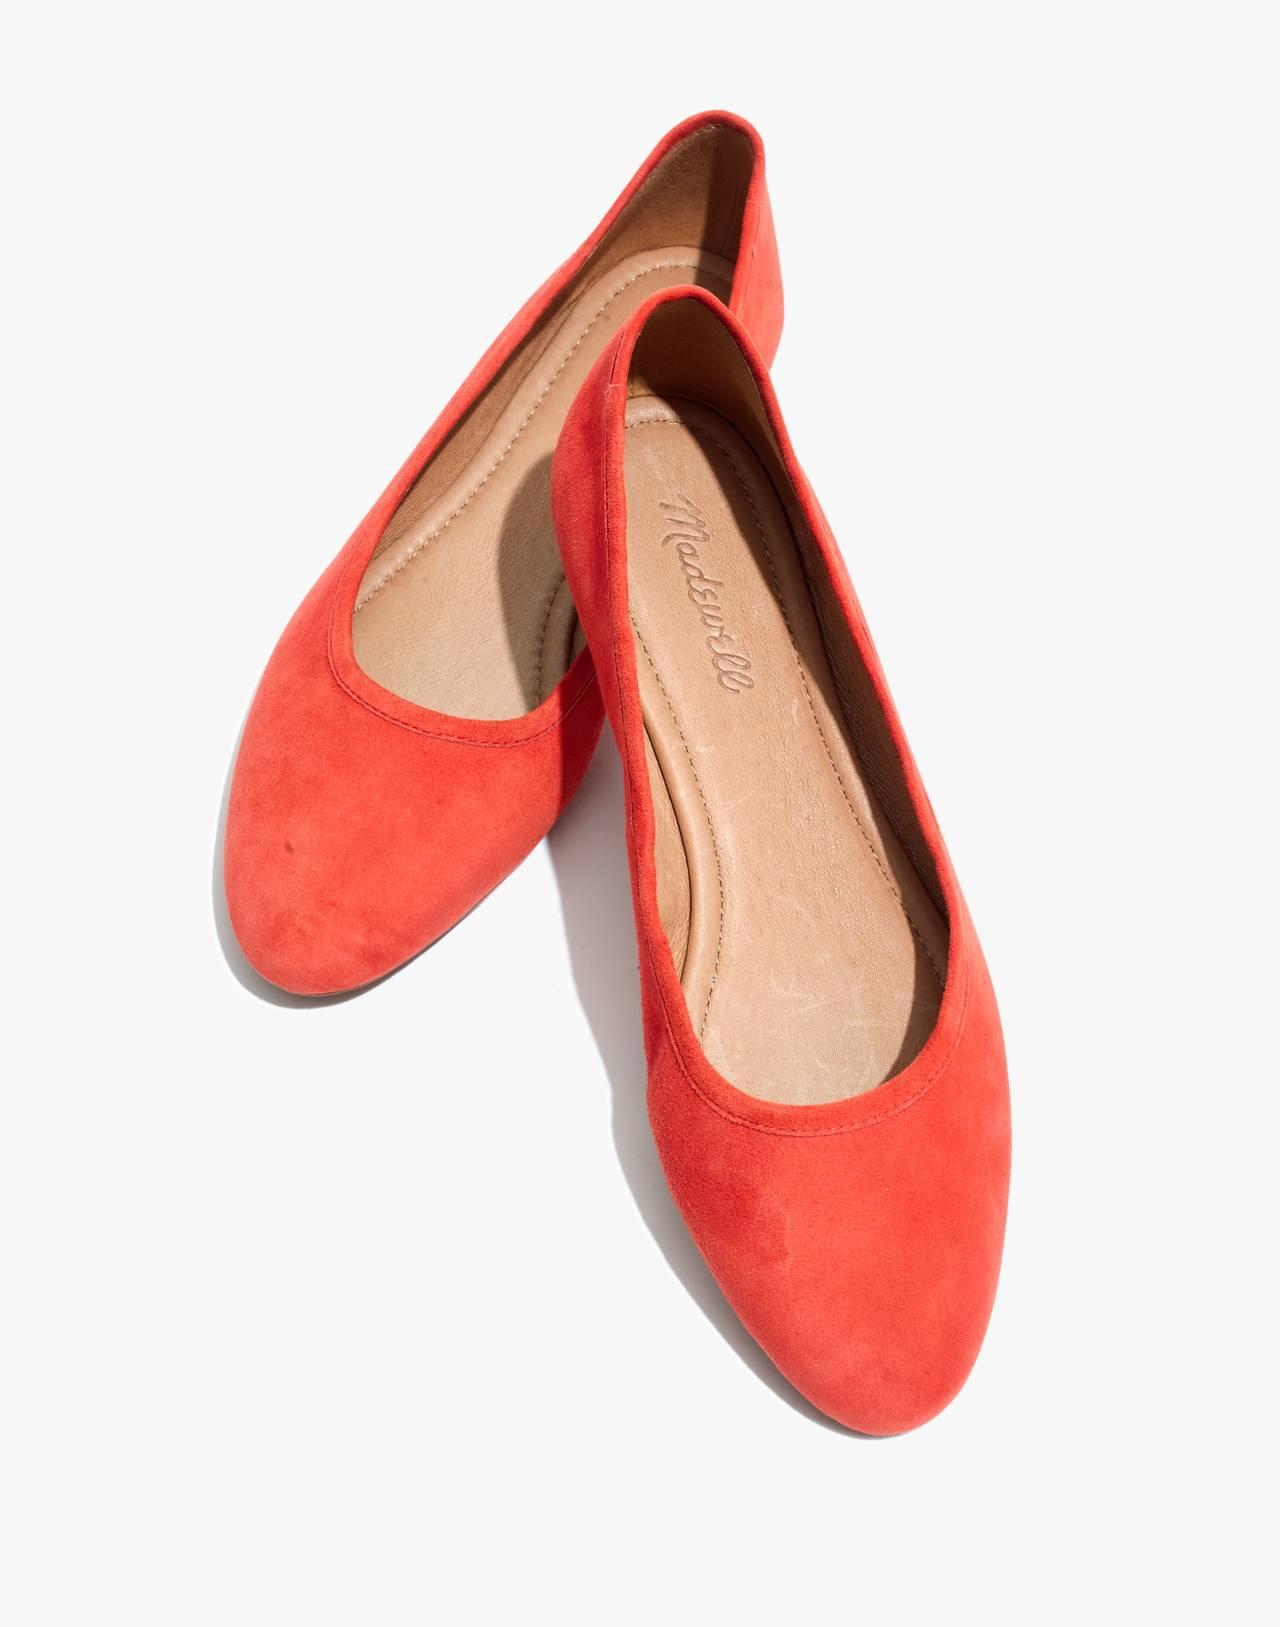 The Reid Ballet Flat in Suede in coastal orange image 1